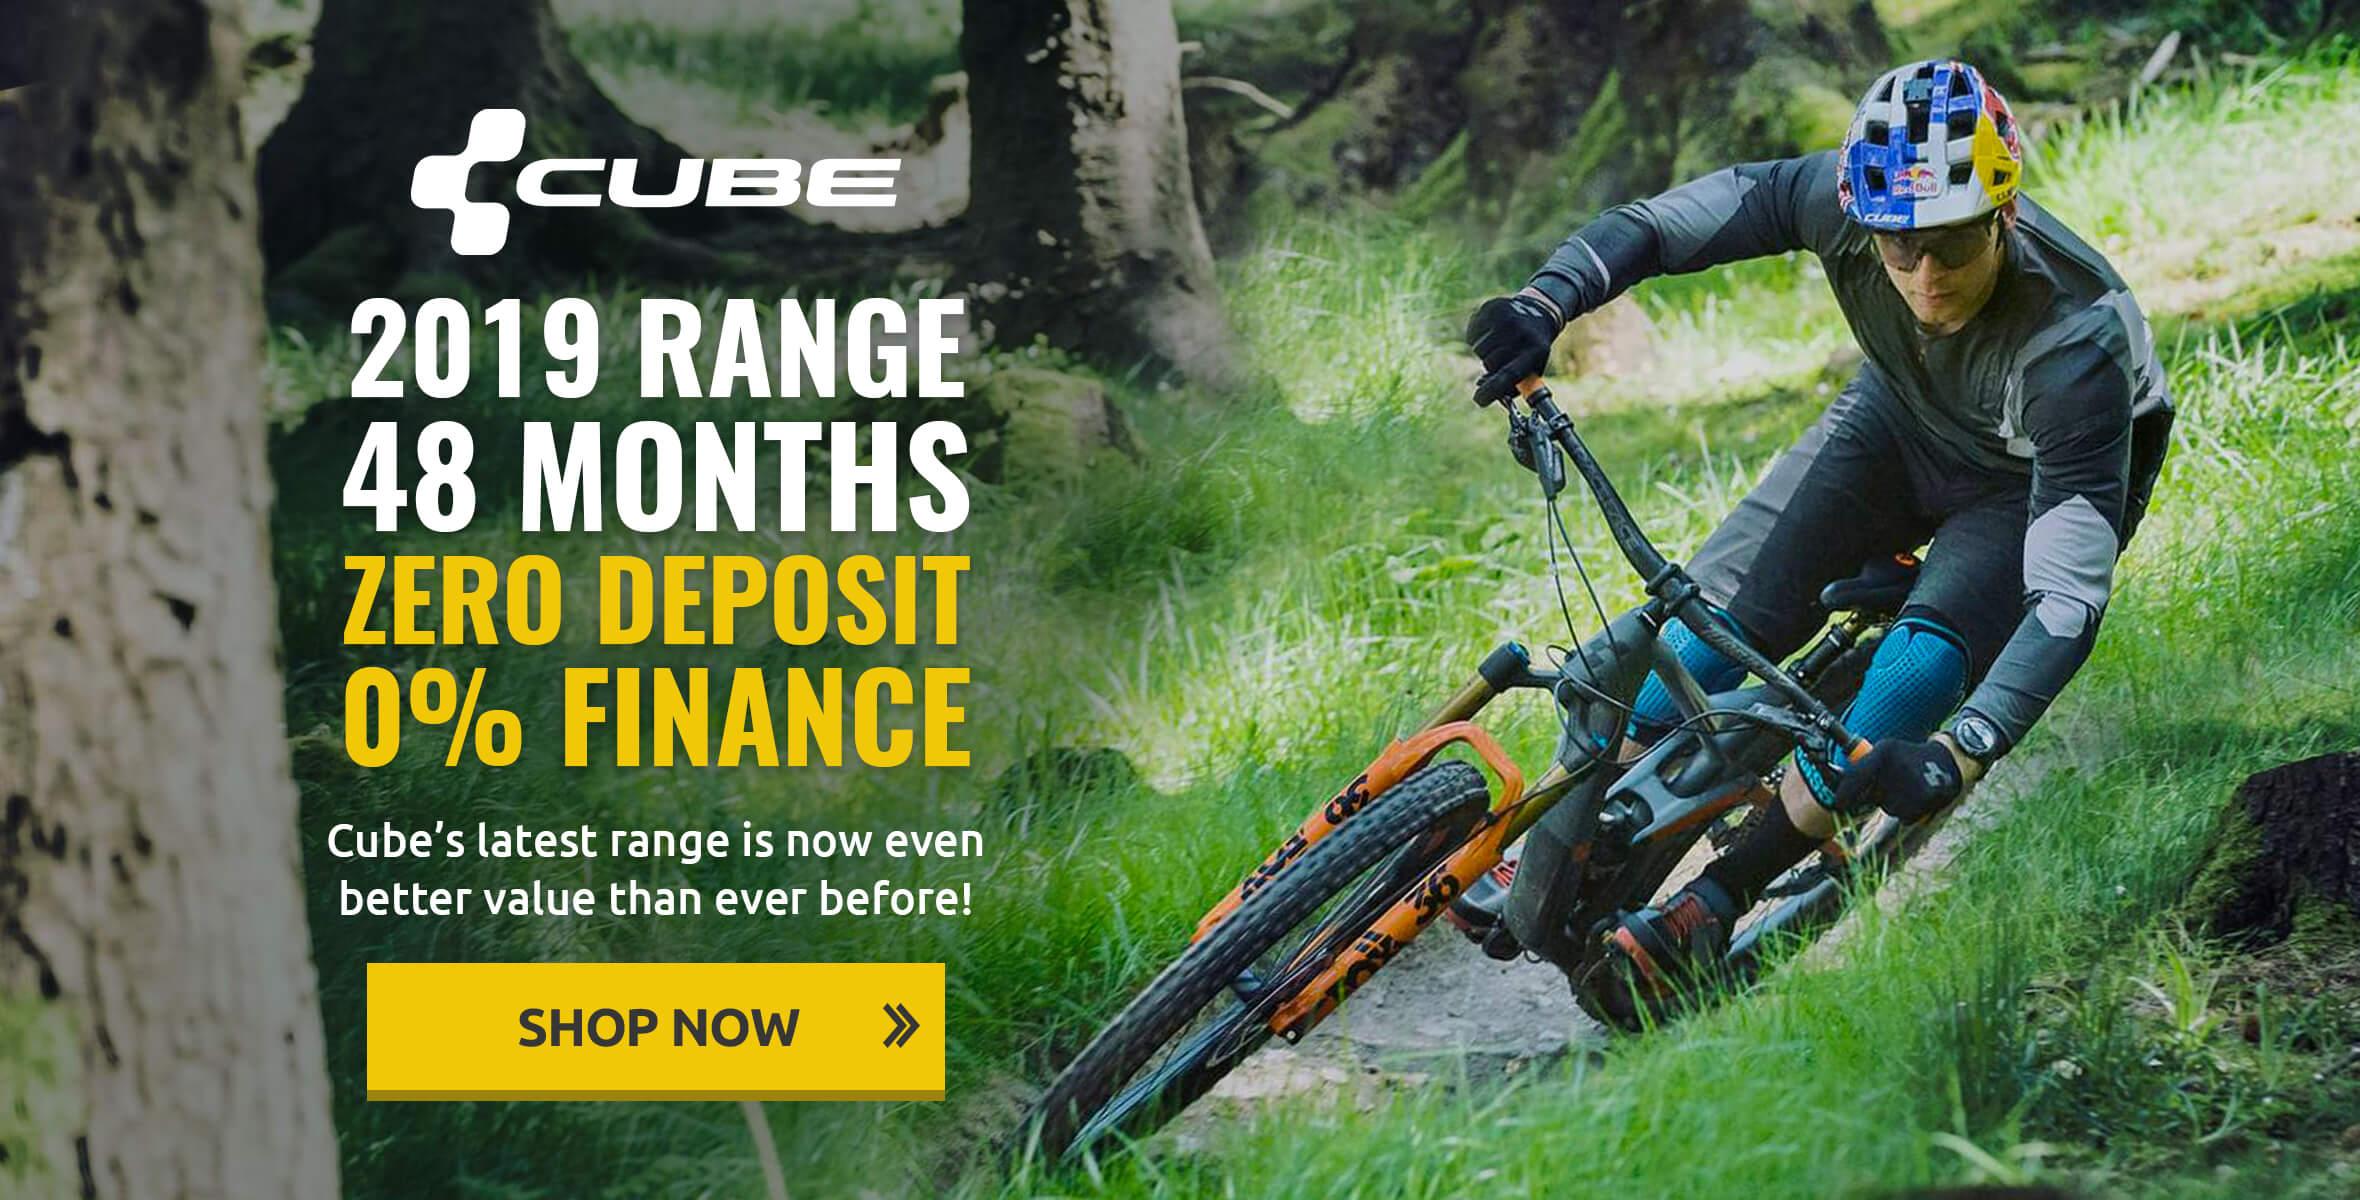 Cube 2019 Range Zero Deposit 0% Finance